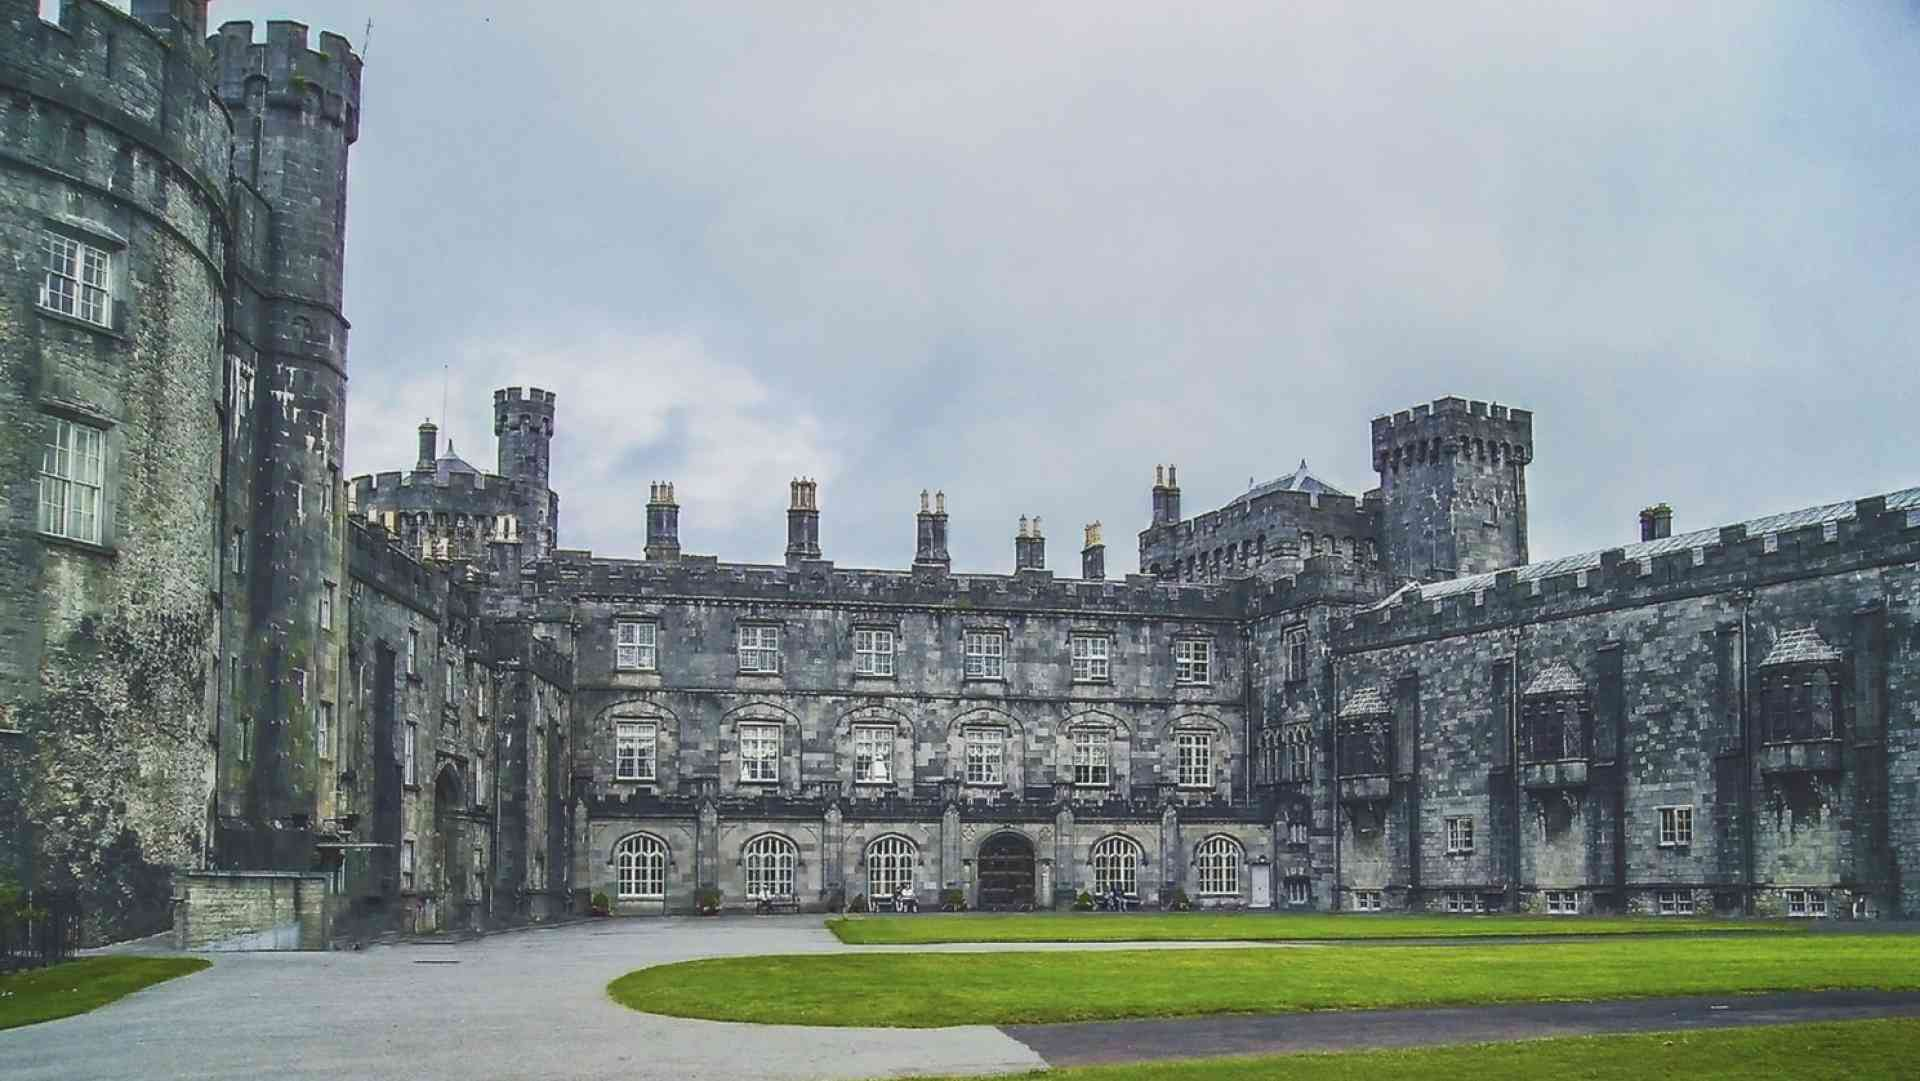 Kilkenny Castle, Ireland by K. Mitch Hodge/Unsplash